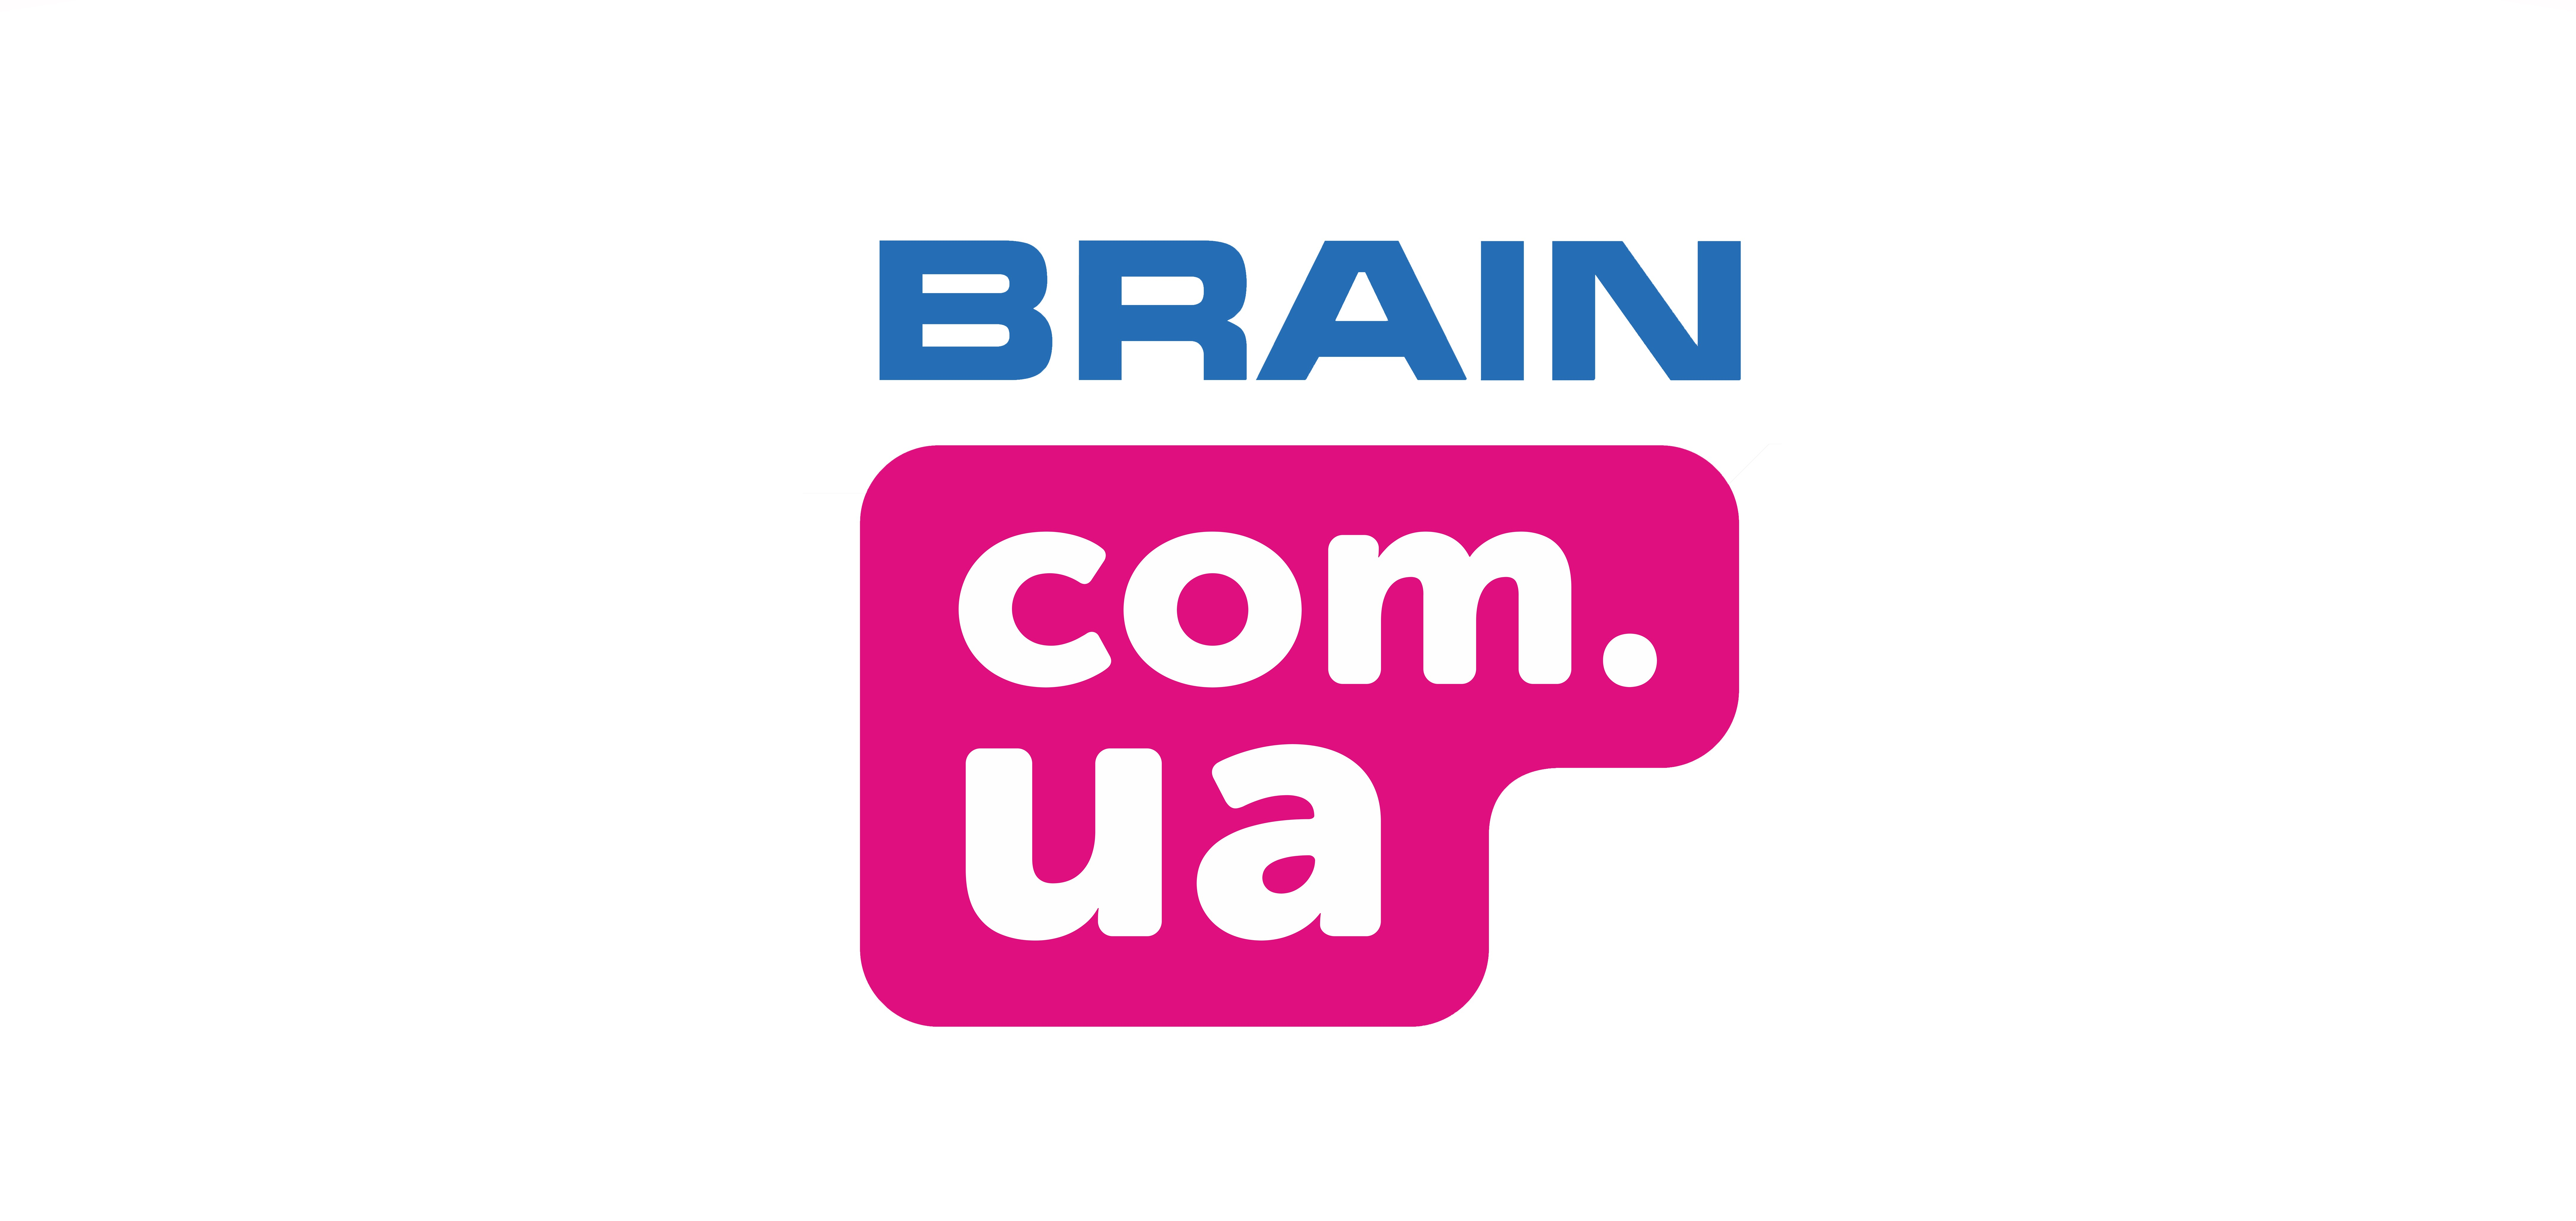 channel_1508744608braincom2.jpg